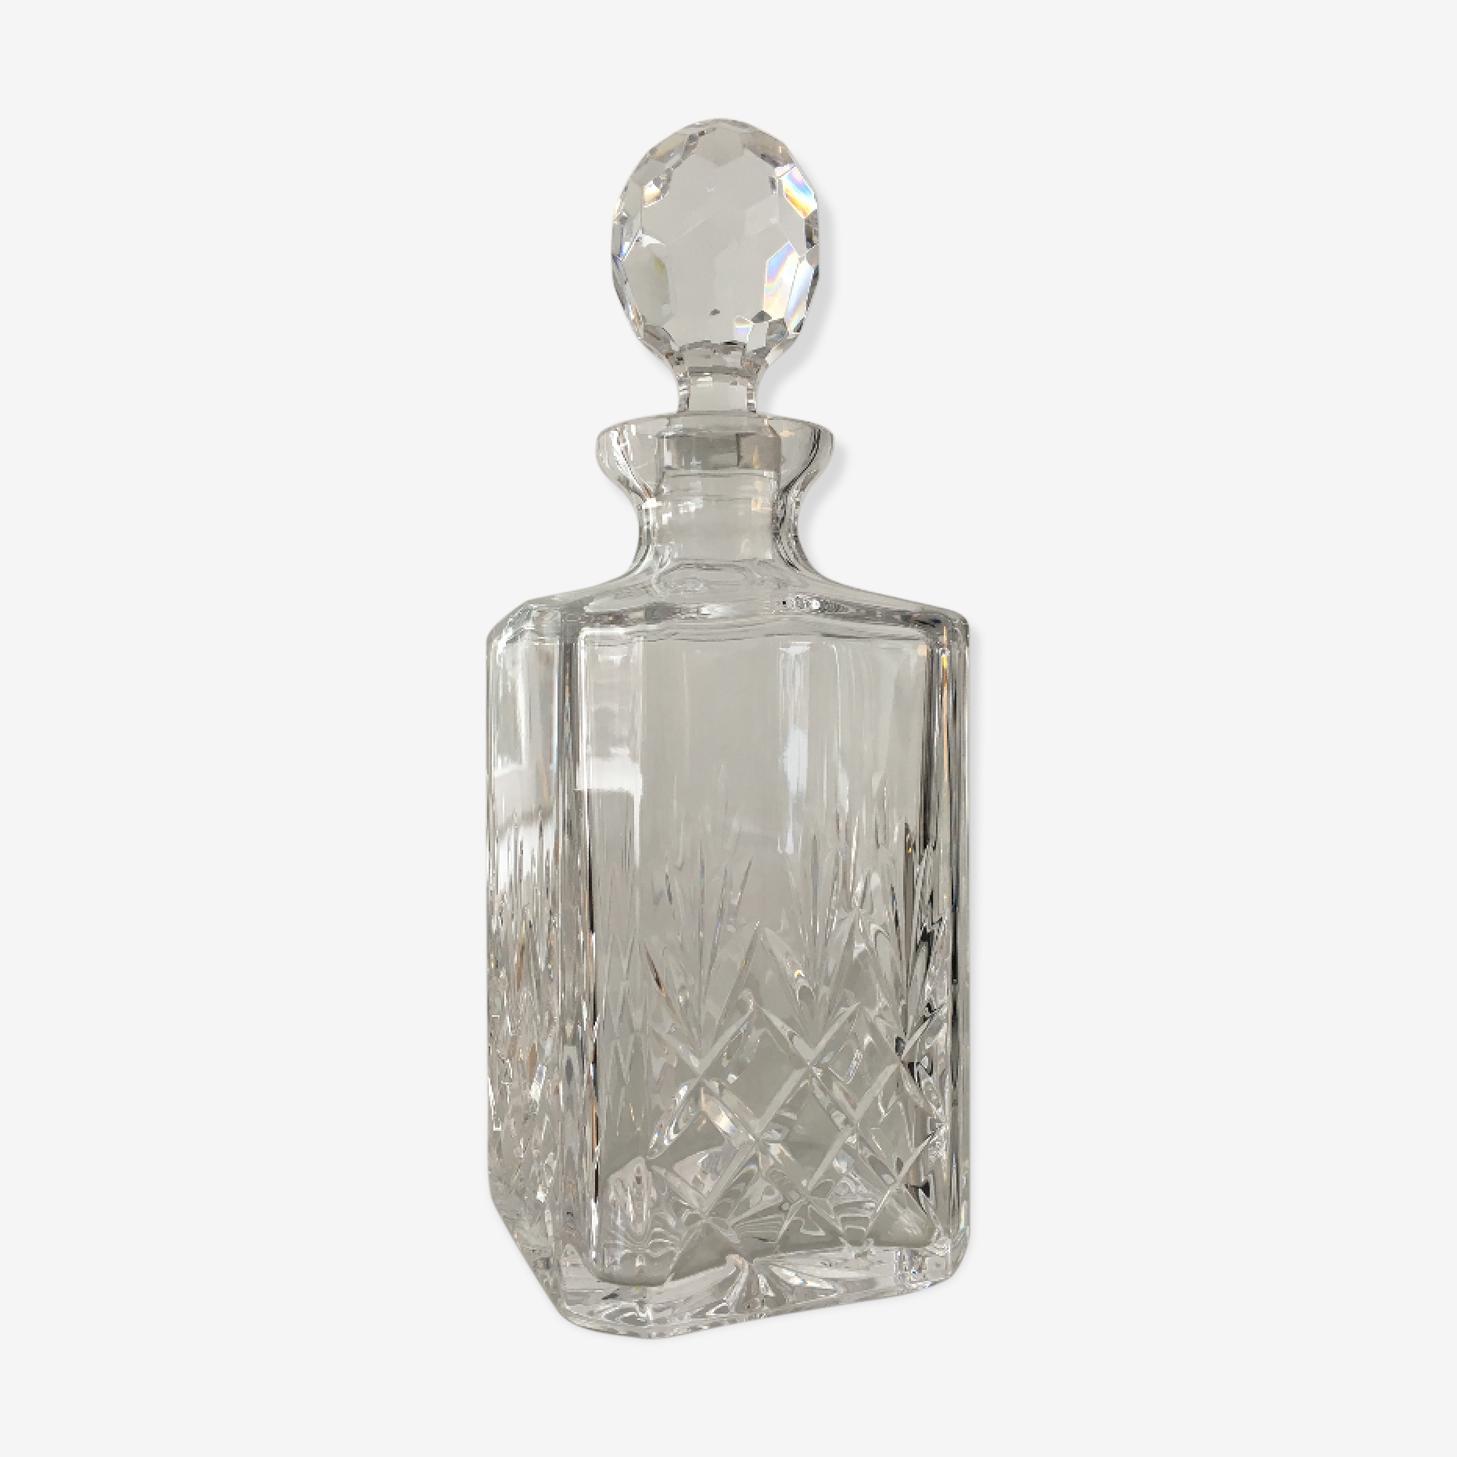 Carafe en cristal avec son bouchon